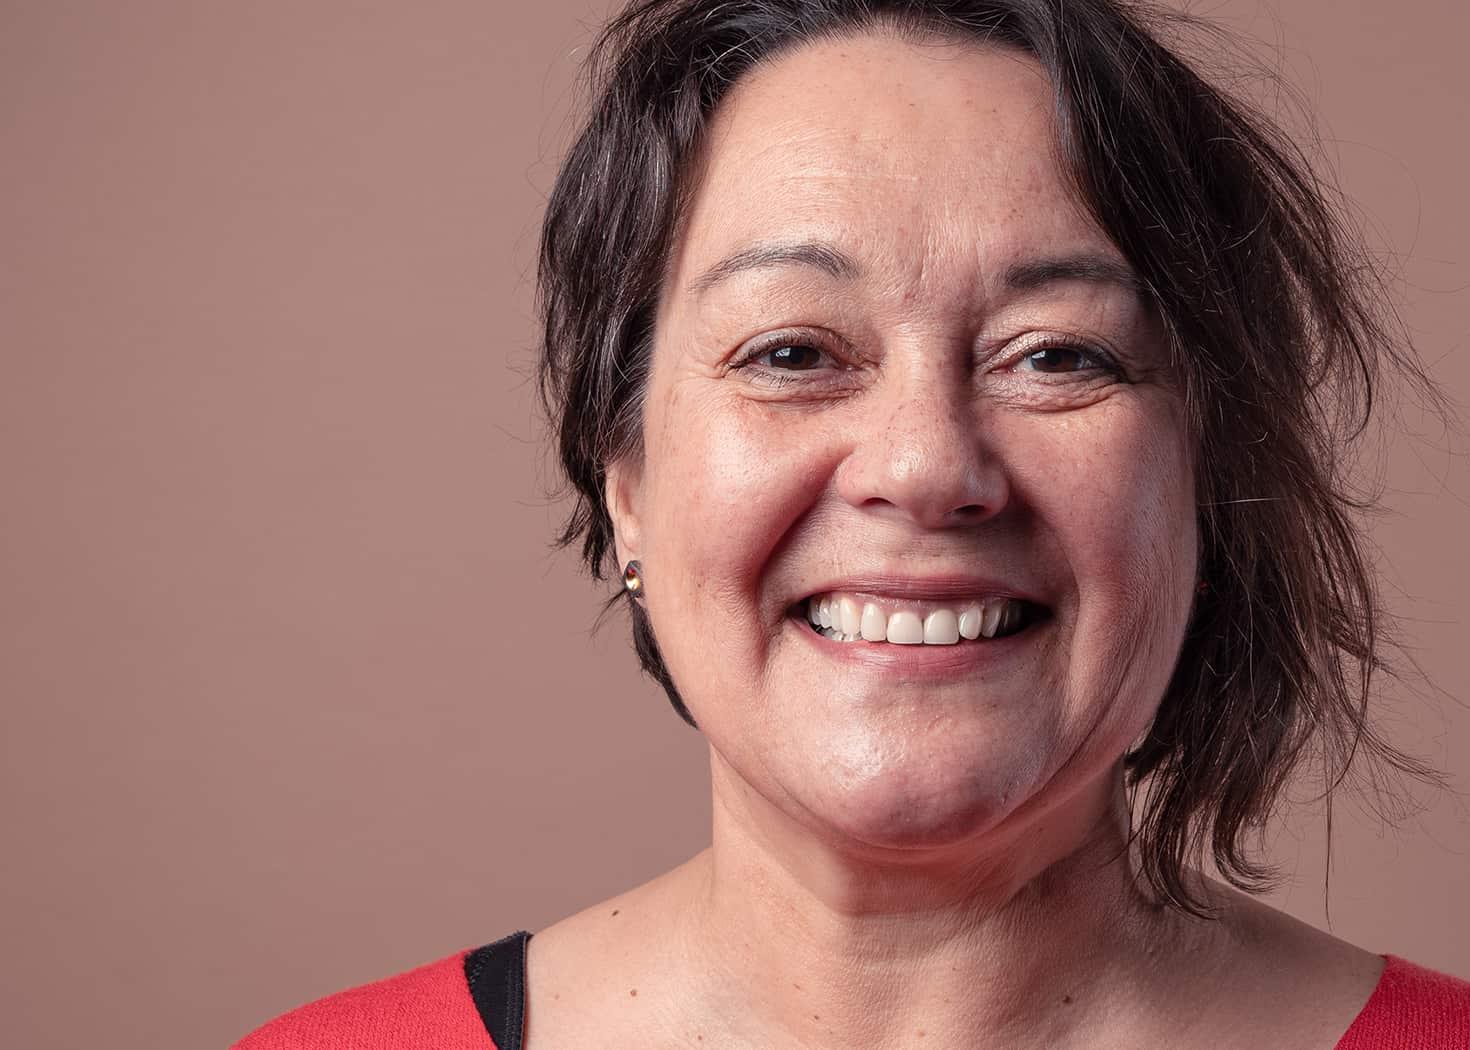 Sonja Njølstad